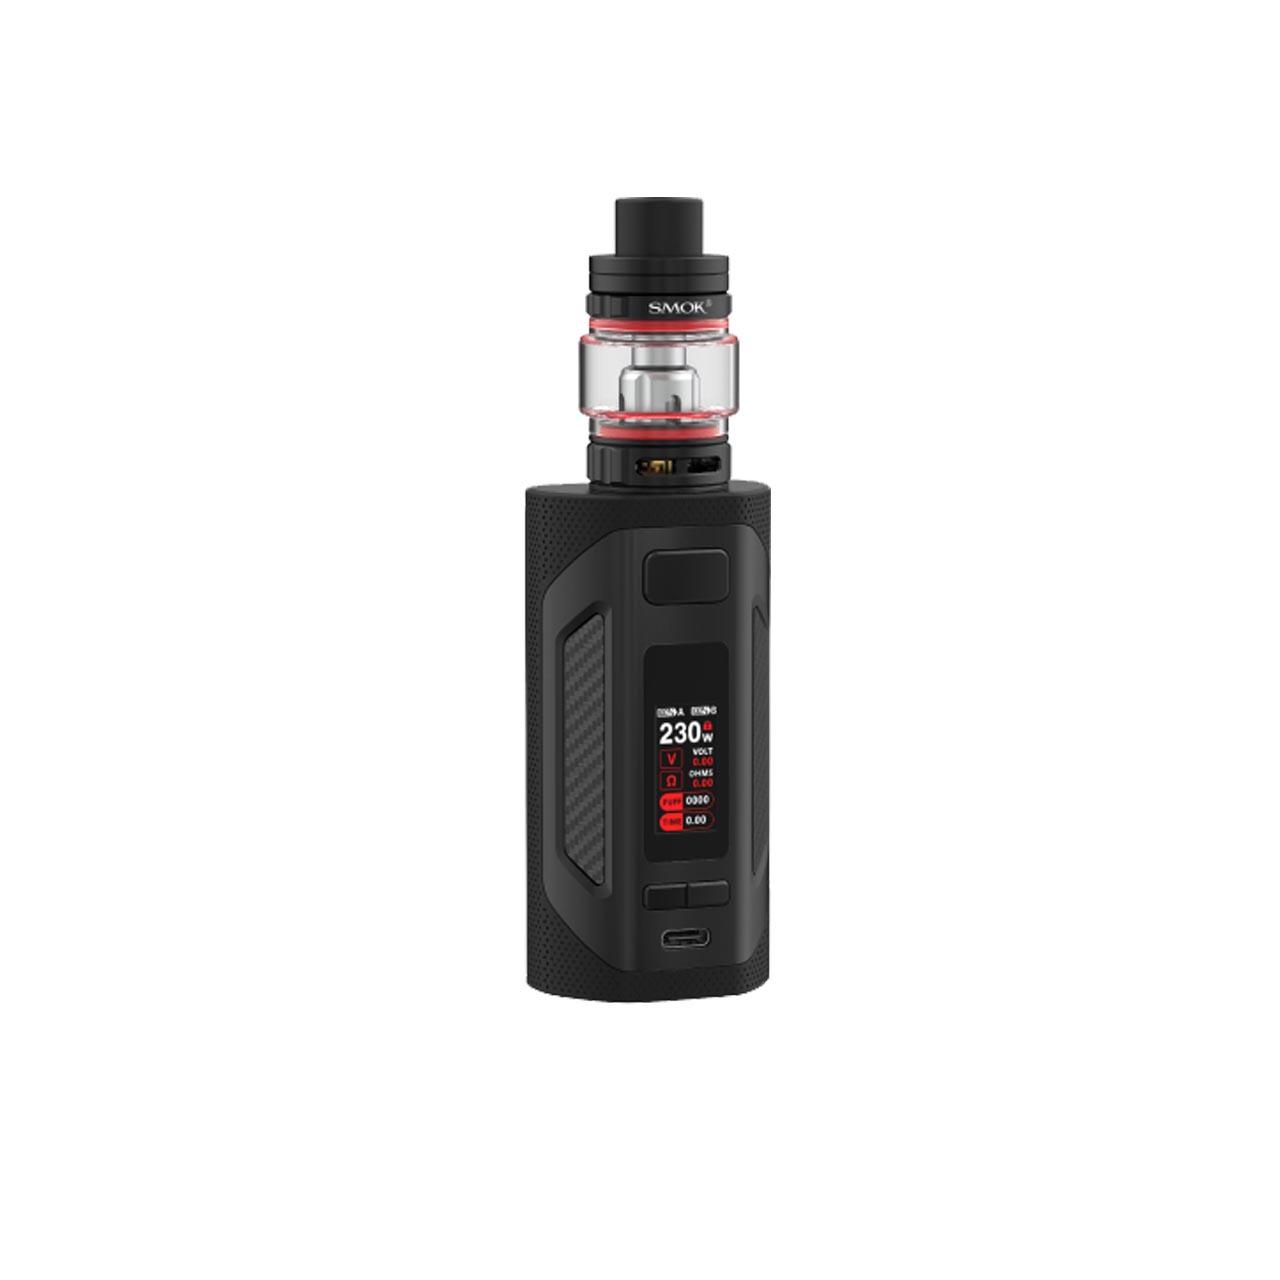 SMOK RIGEL Kit Black